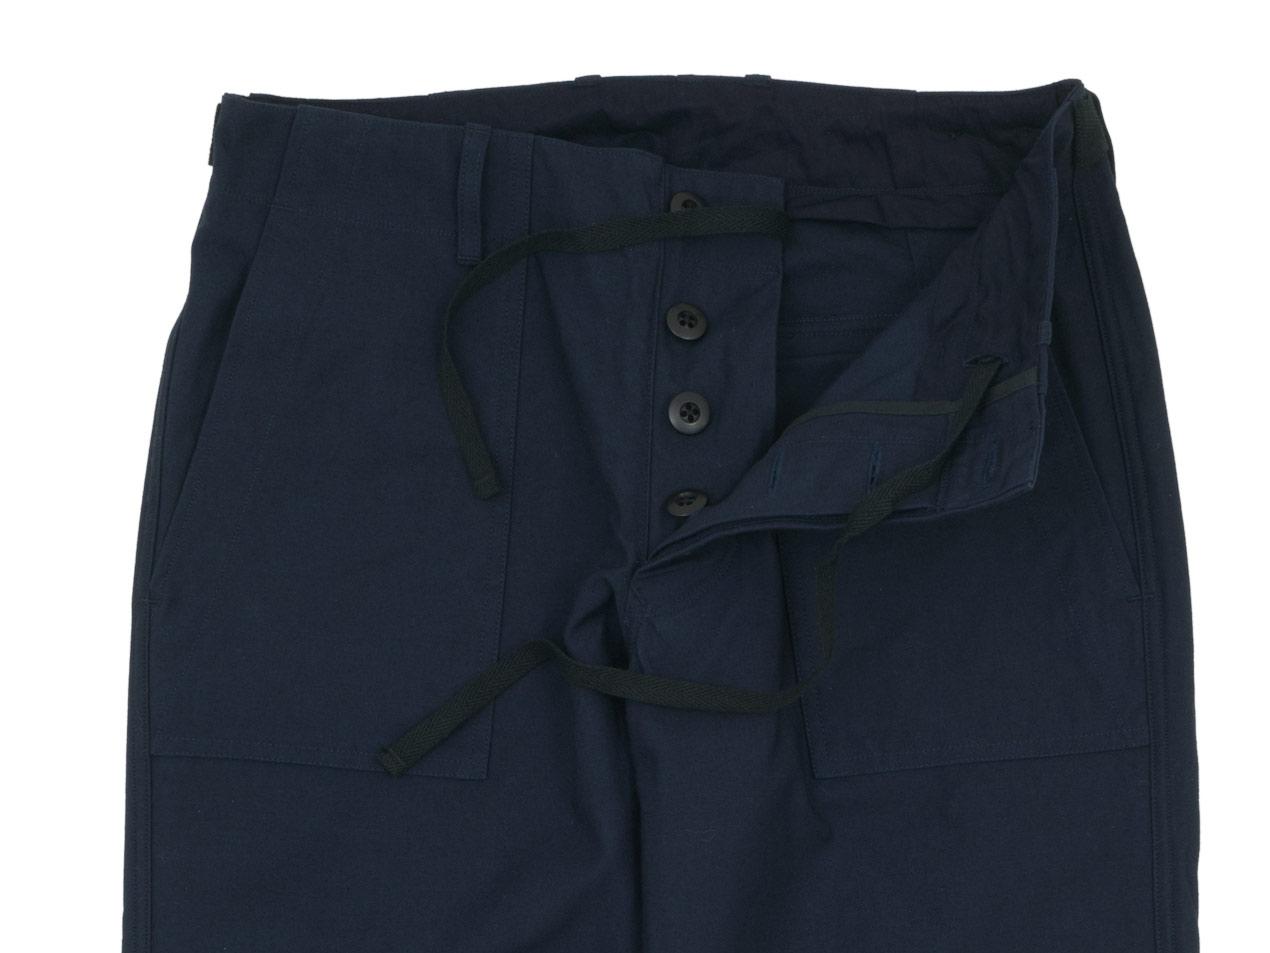 maillot military n/c baker pants